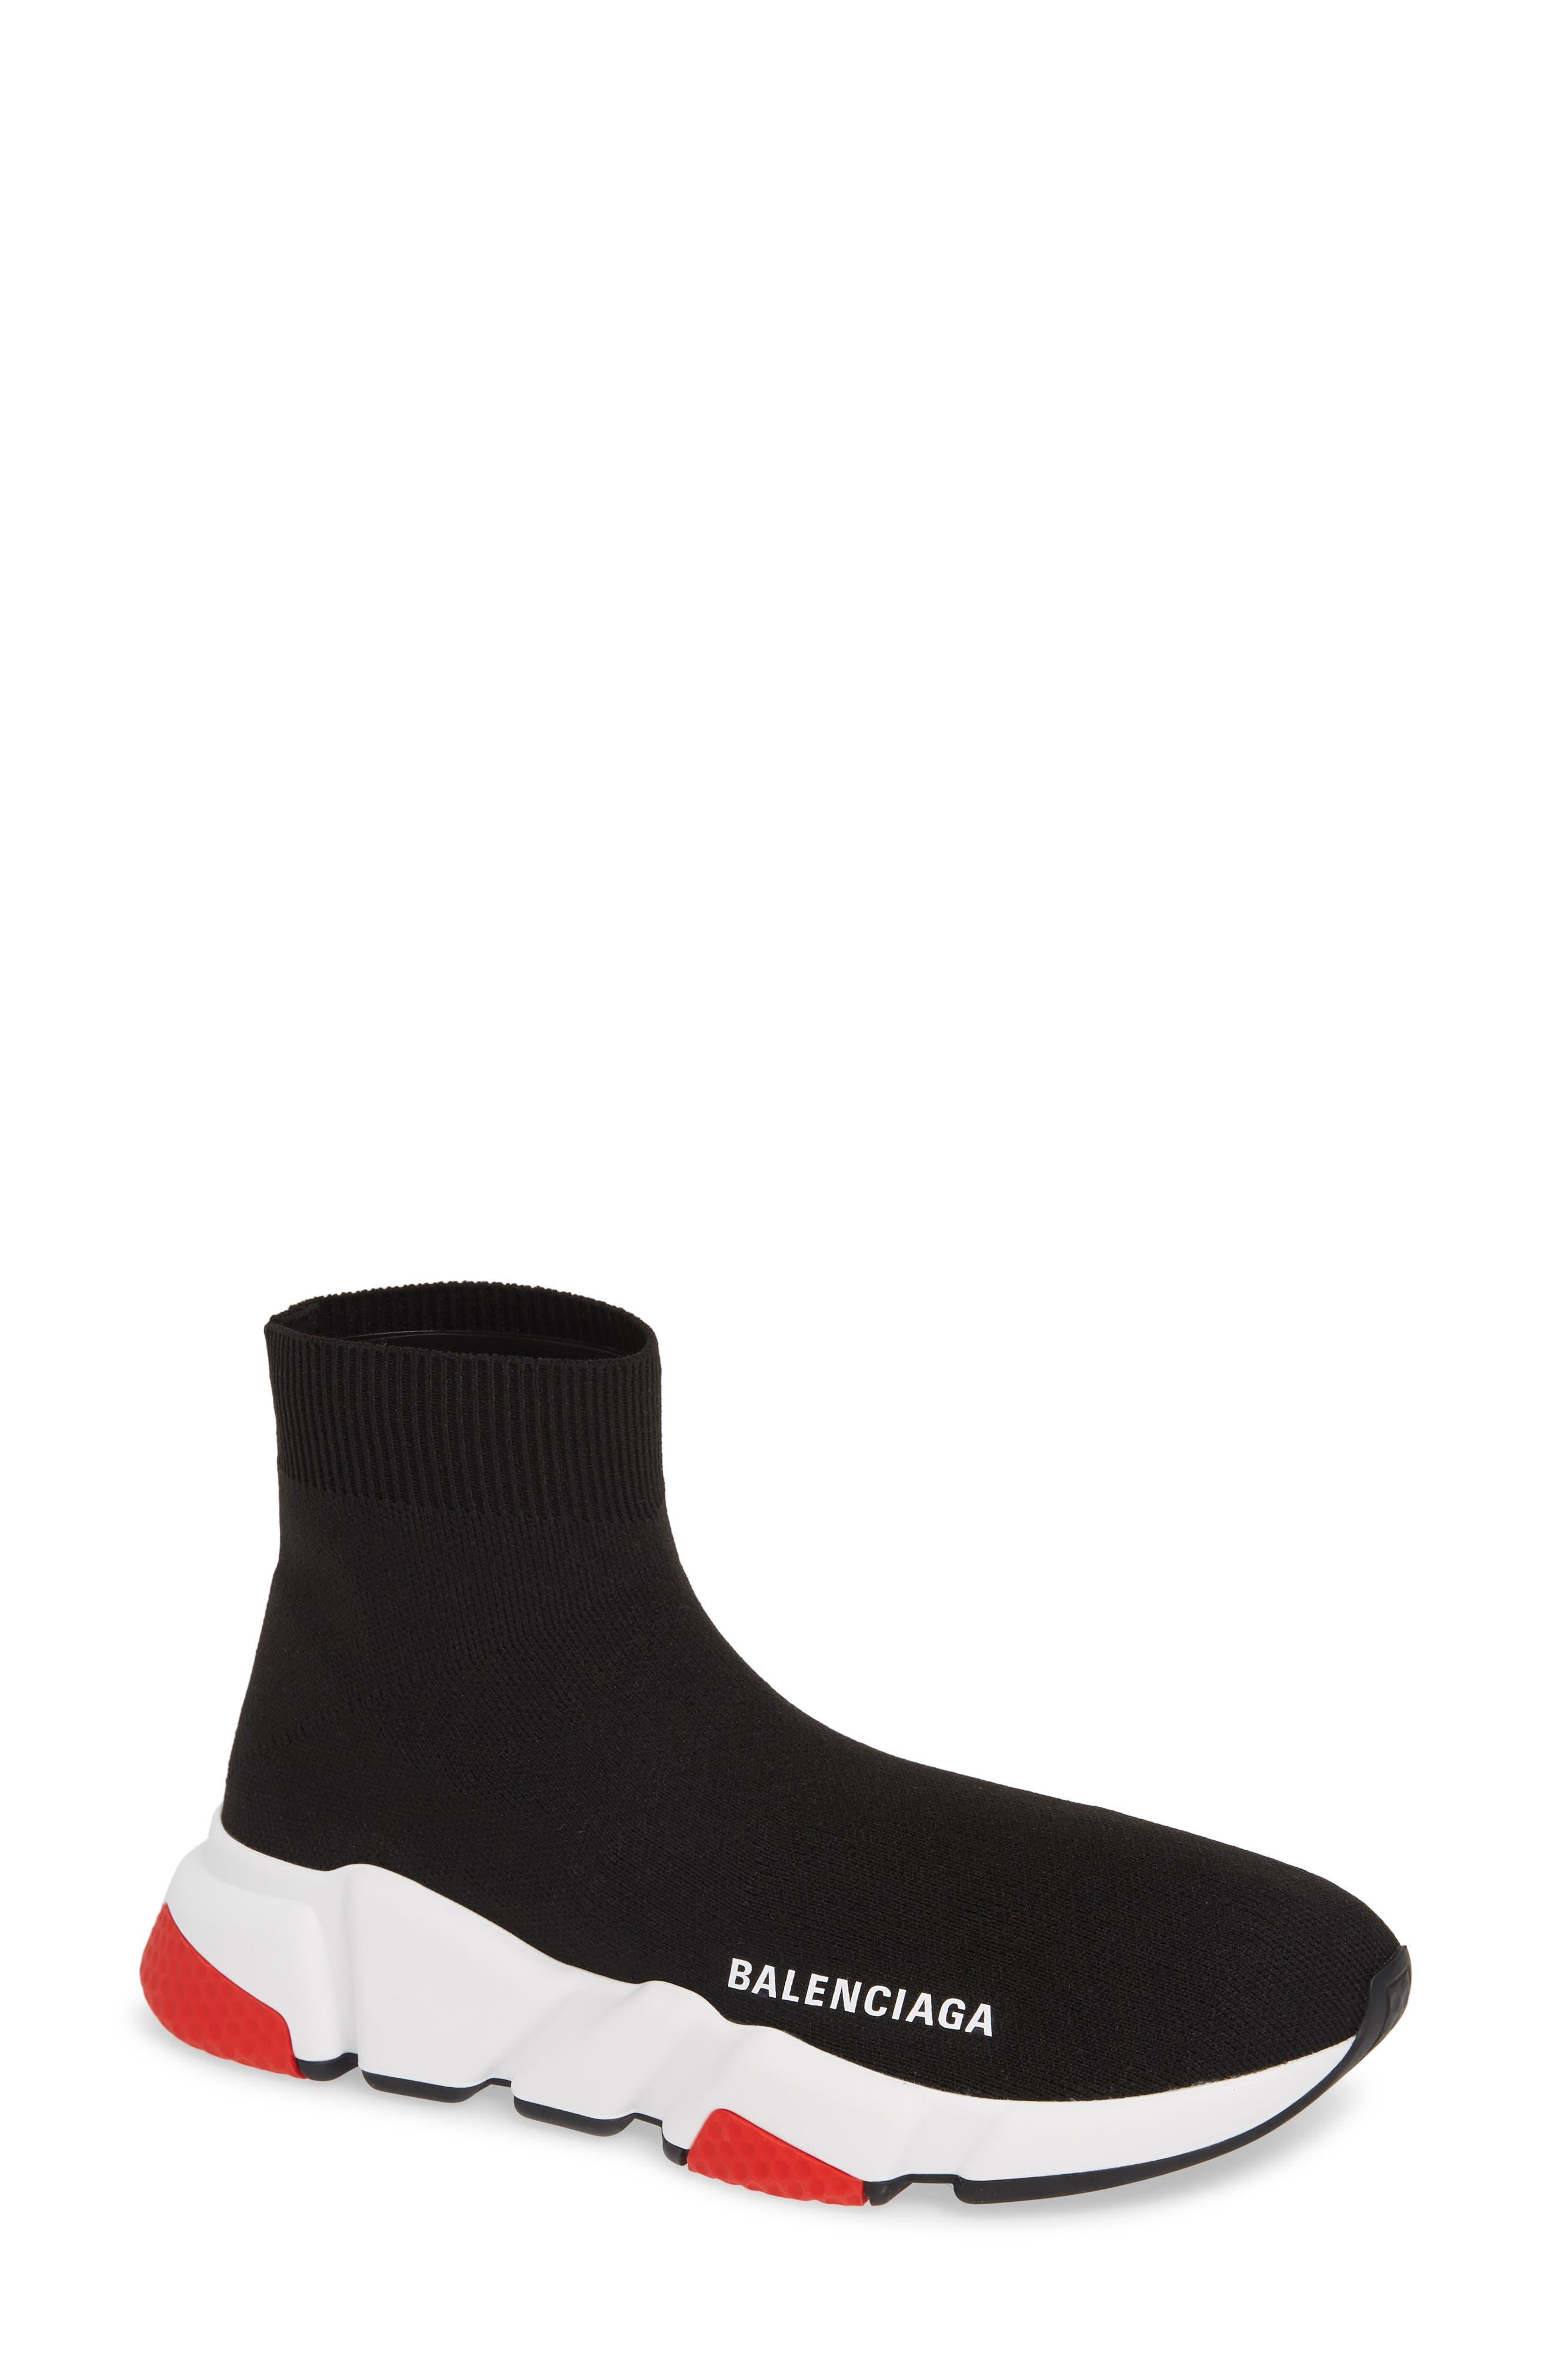 BALENCIAGA Speed Knit Sneaker, Main, color, BLACK/ RED